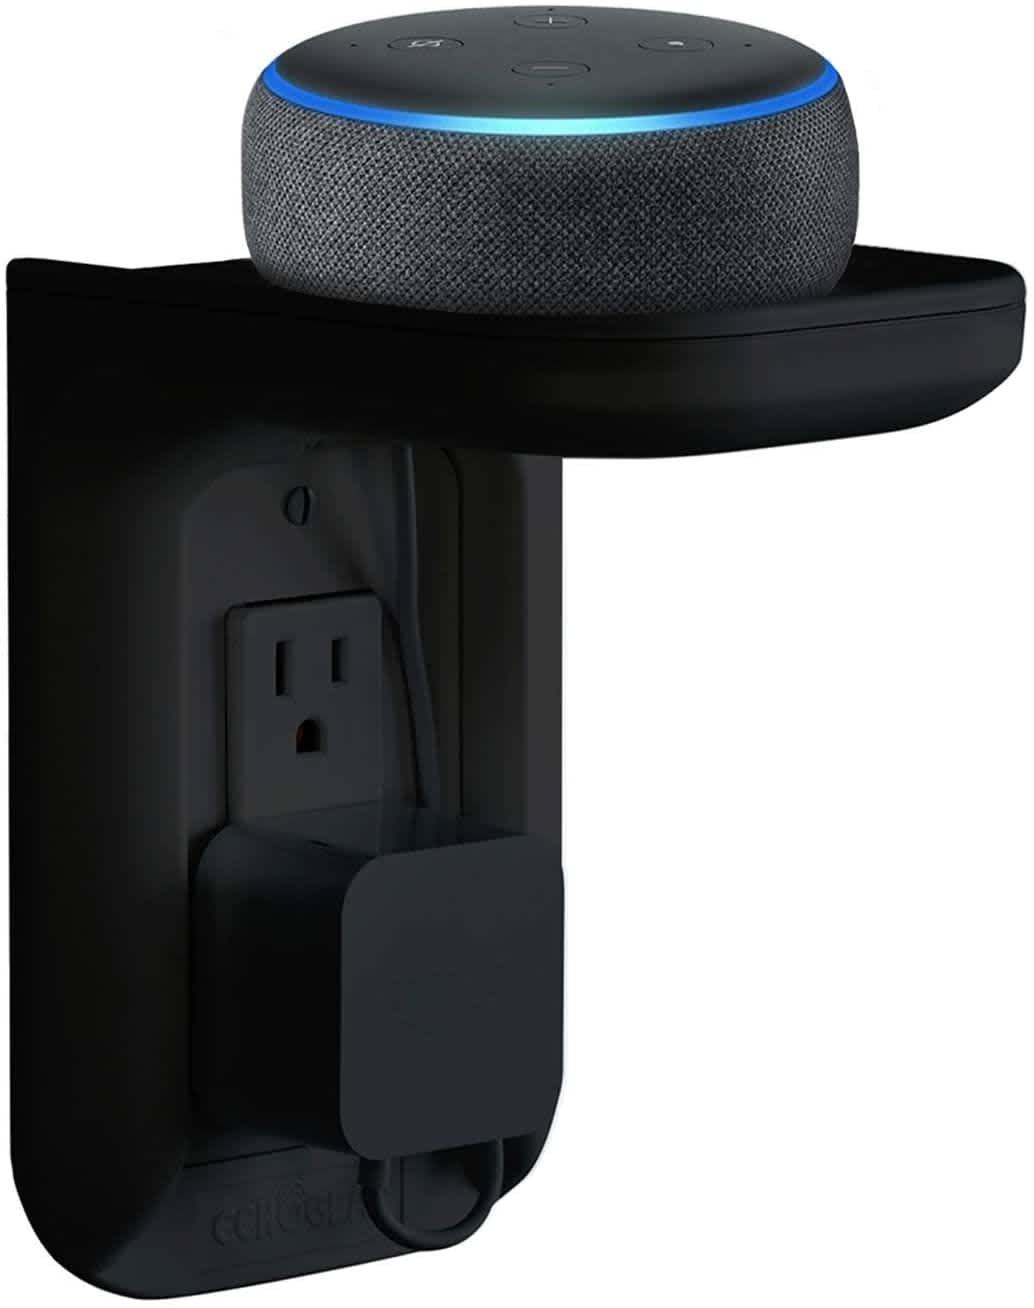 Amazon Echo Outlet Shelf